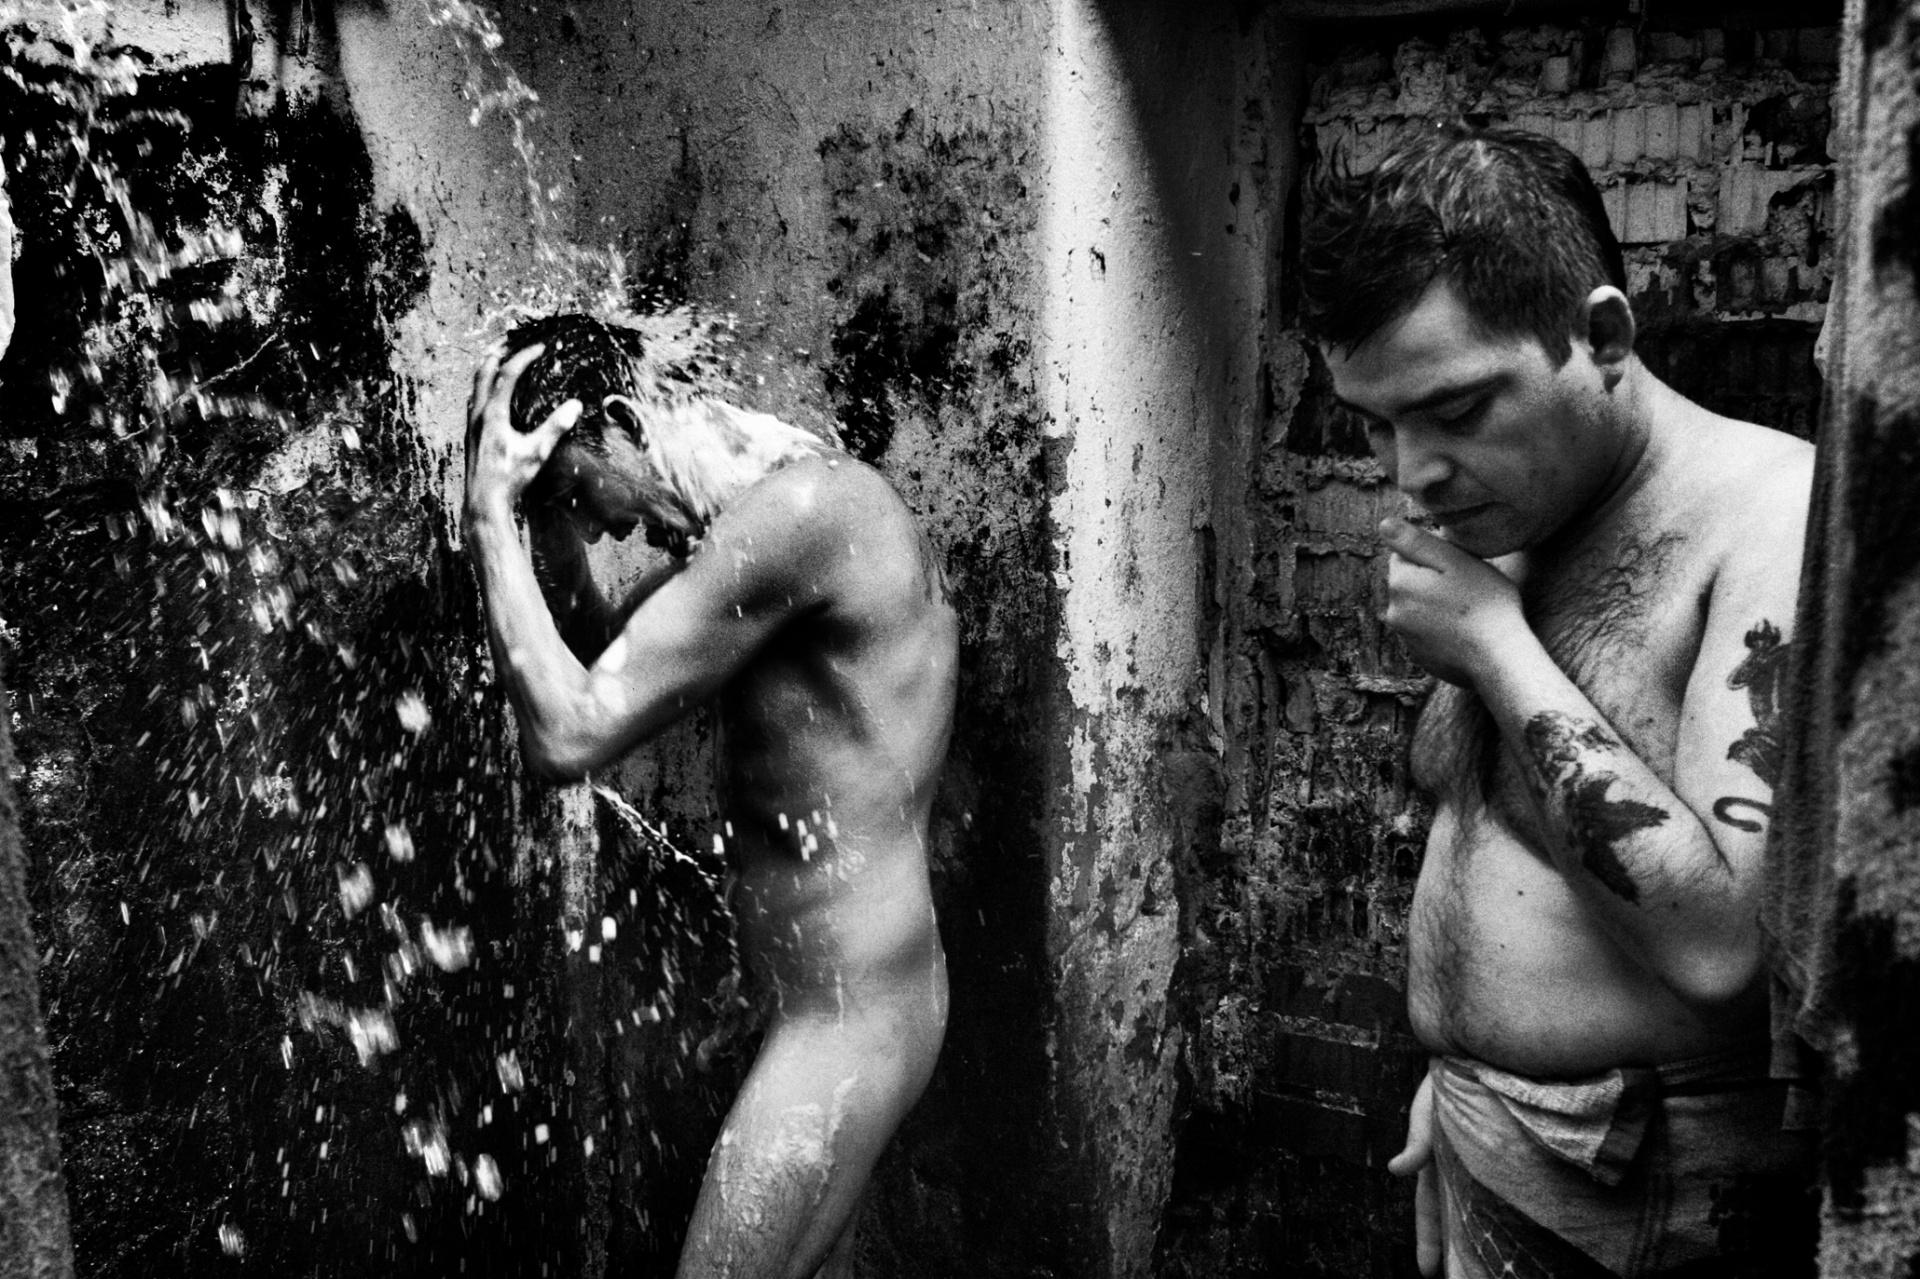 fotograf Valerio Bispuri 3